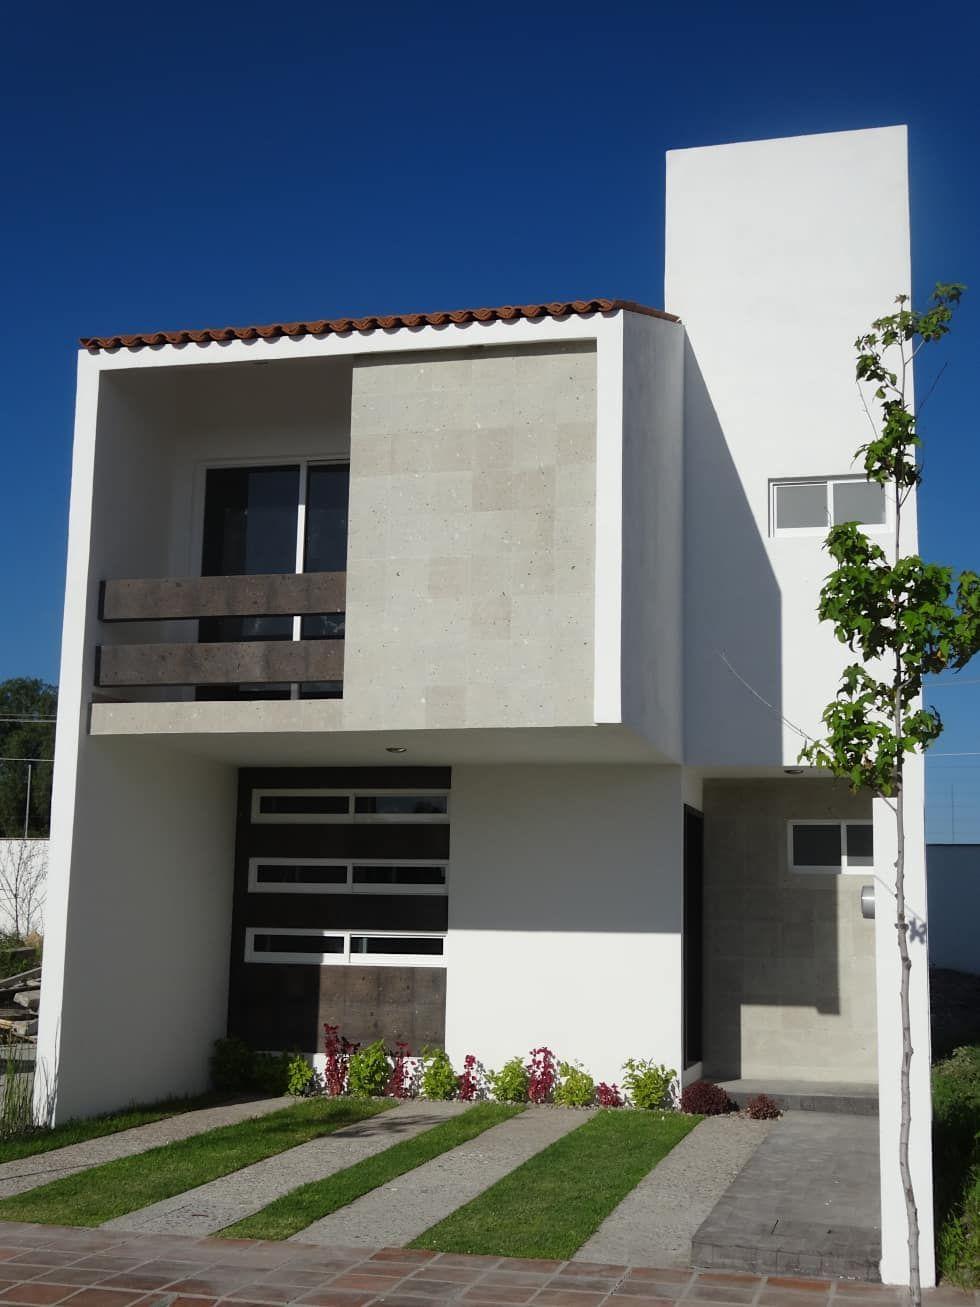 Casa ped casas de estilo por constructora arqoce en 2019 for Disenos de casas de playa pequenas